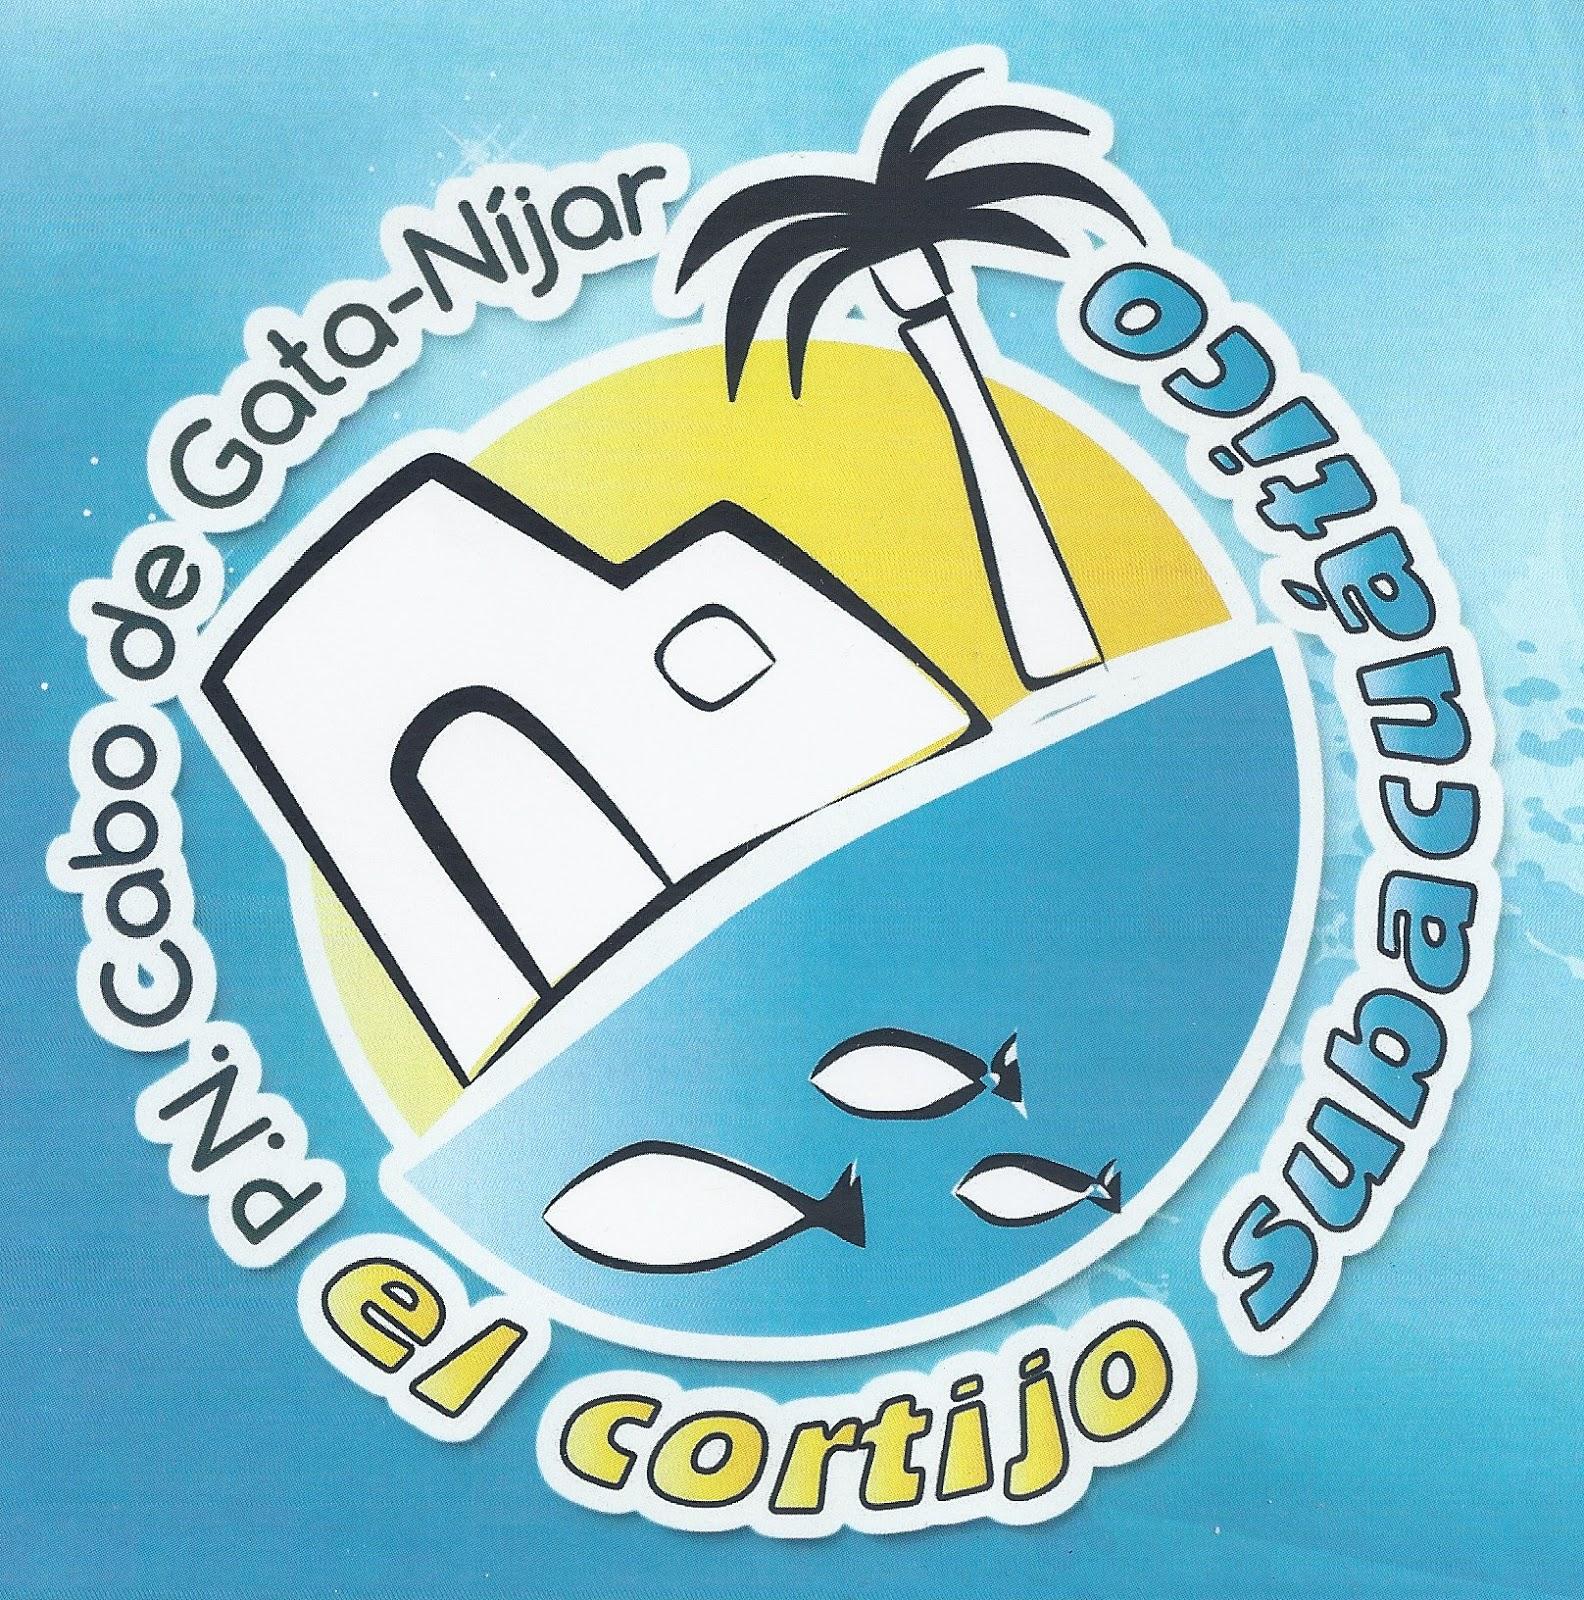 www.elcortijosubacuático.com